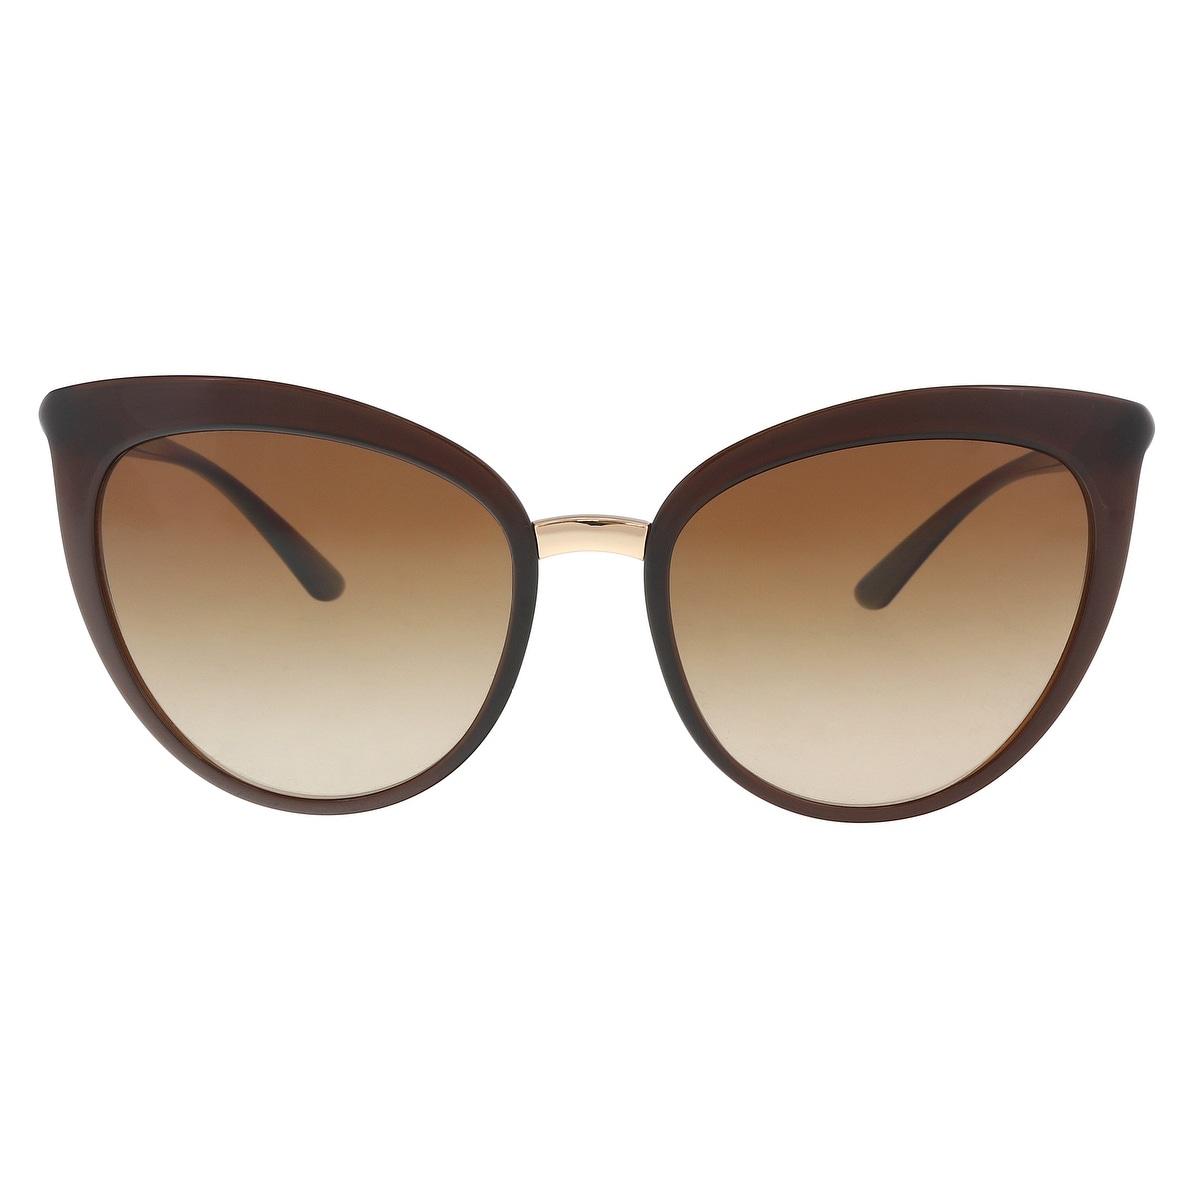 8e3255b5e30b Shop Dolce & Gabbana DG6113 315913 Transparent Brown Cat Eye Sunglasses -  55-18-140 - Ships To Canada - Overstock - 21158219